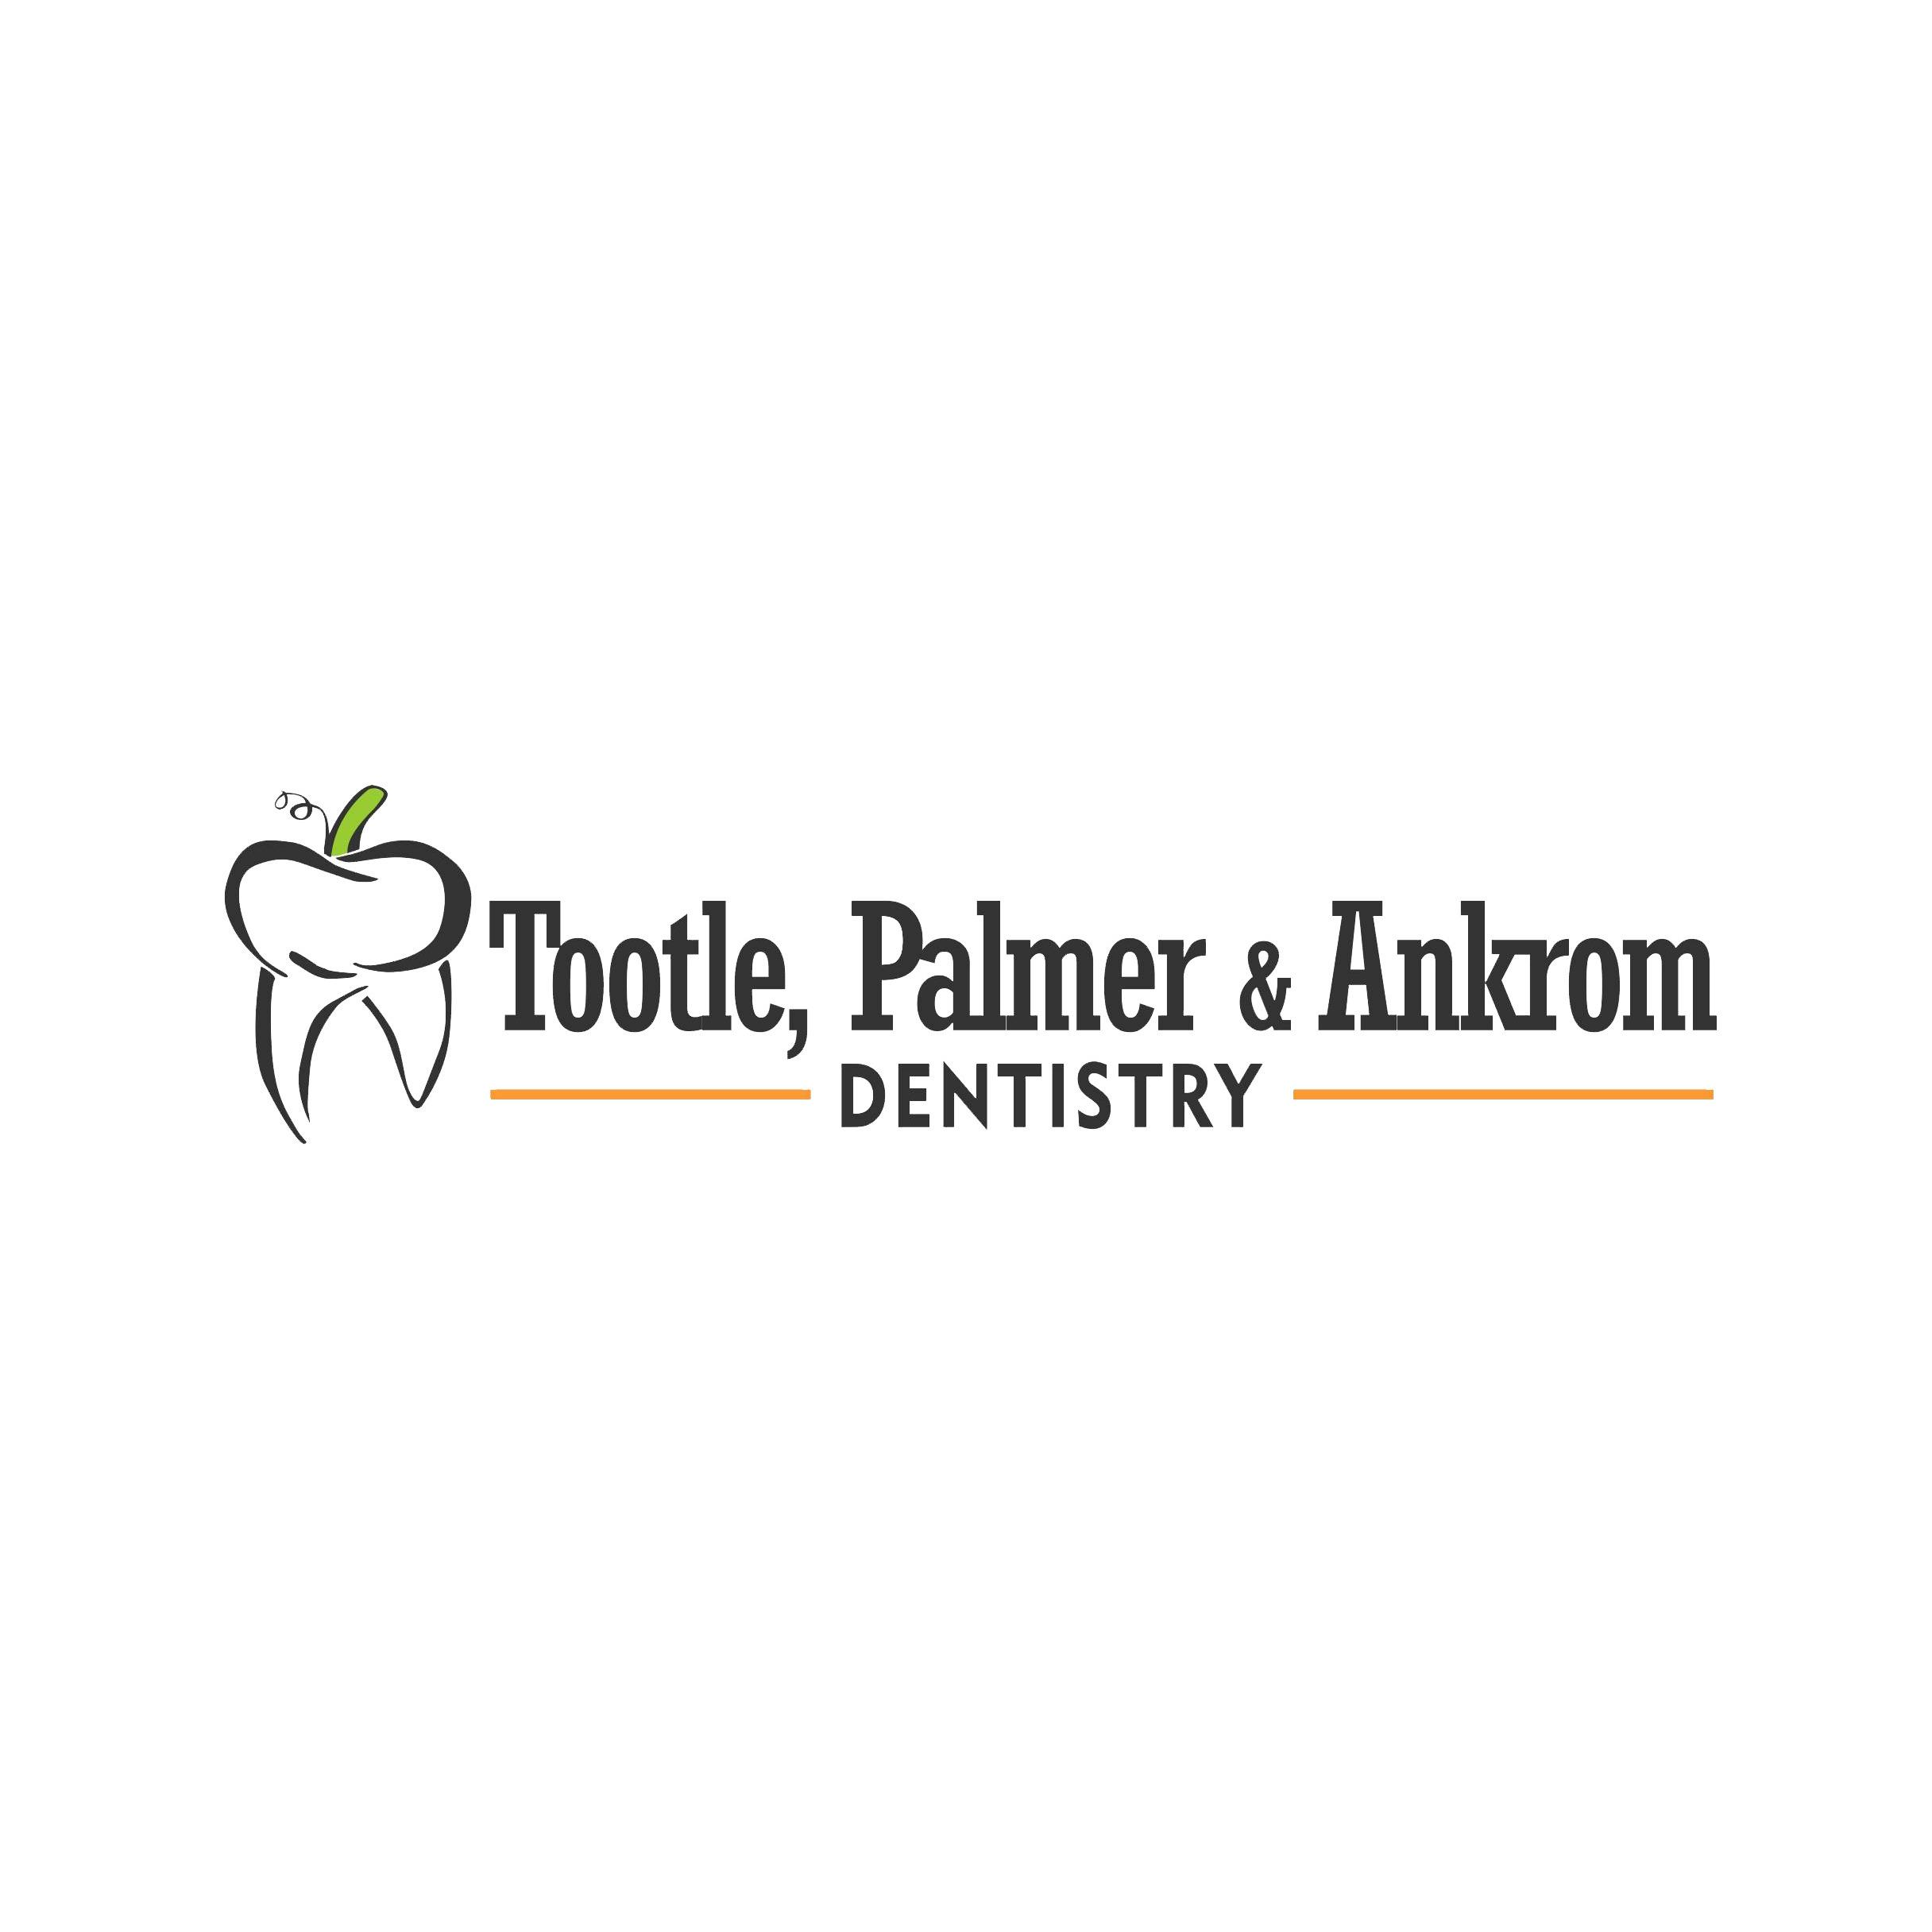 Tootle, Palmer & Ankrom Dentistry